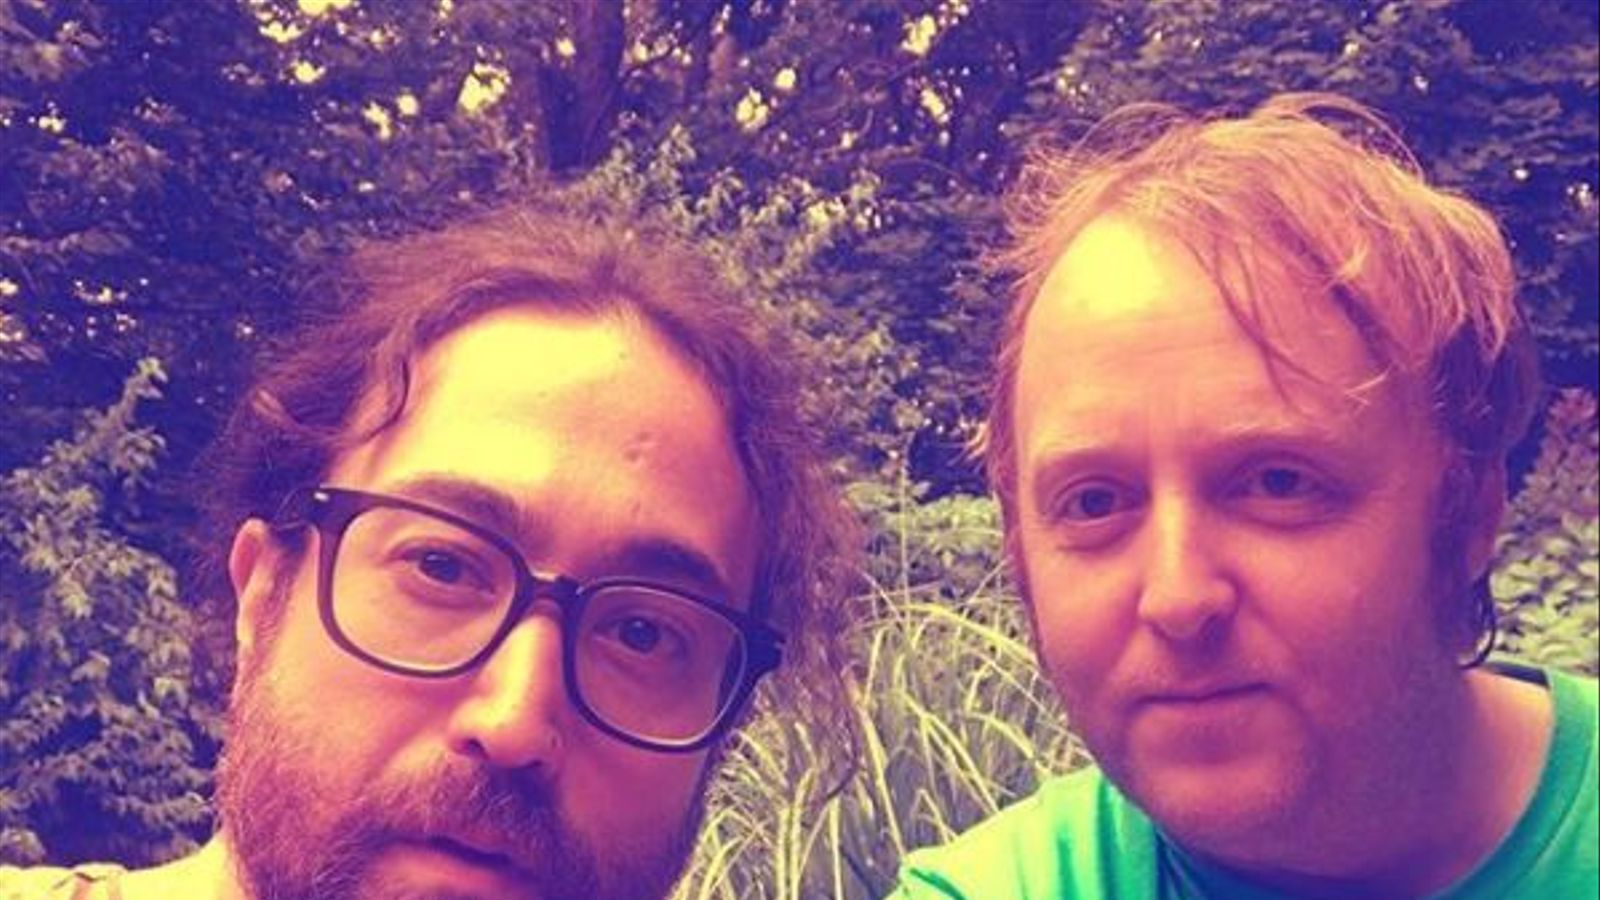 Els fills de Paul McCartney i John Lennon, junts a Instagram